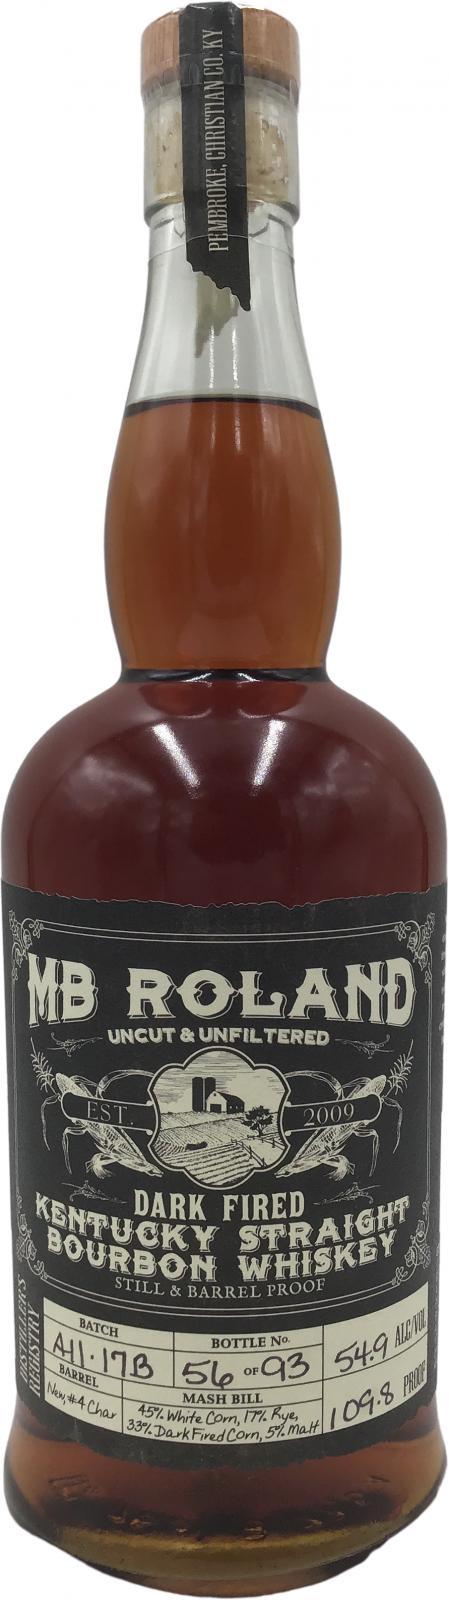 MB Roland Dark Fired - Kentucky Straight Bourbon Whiskey